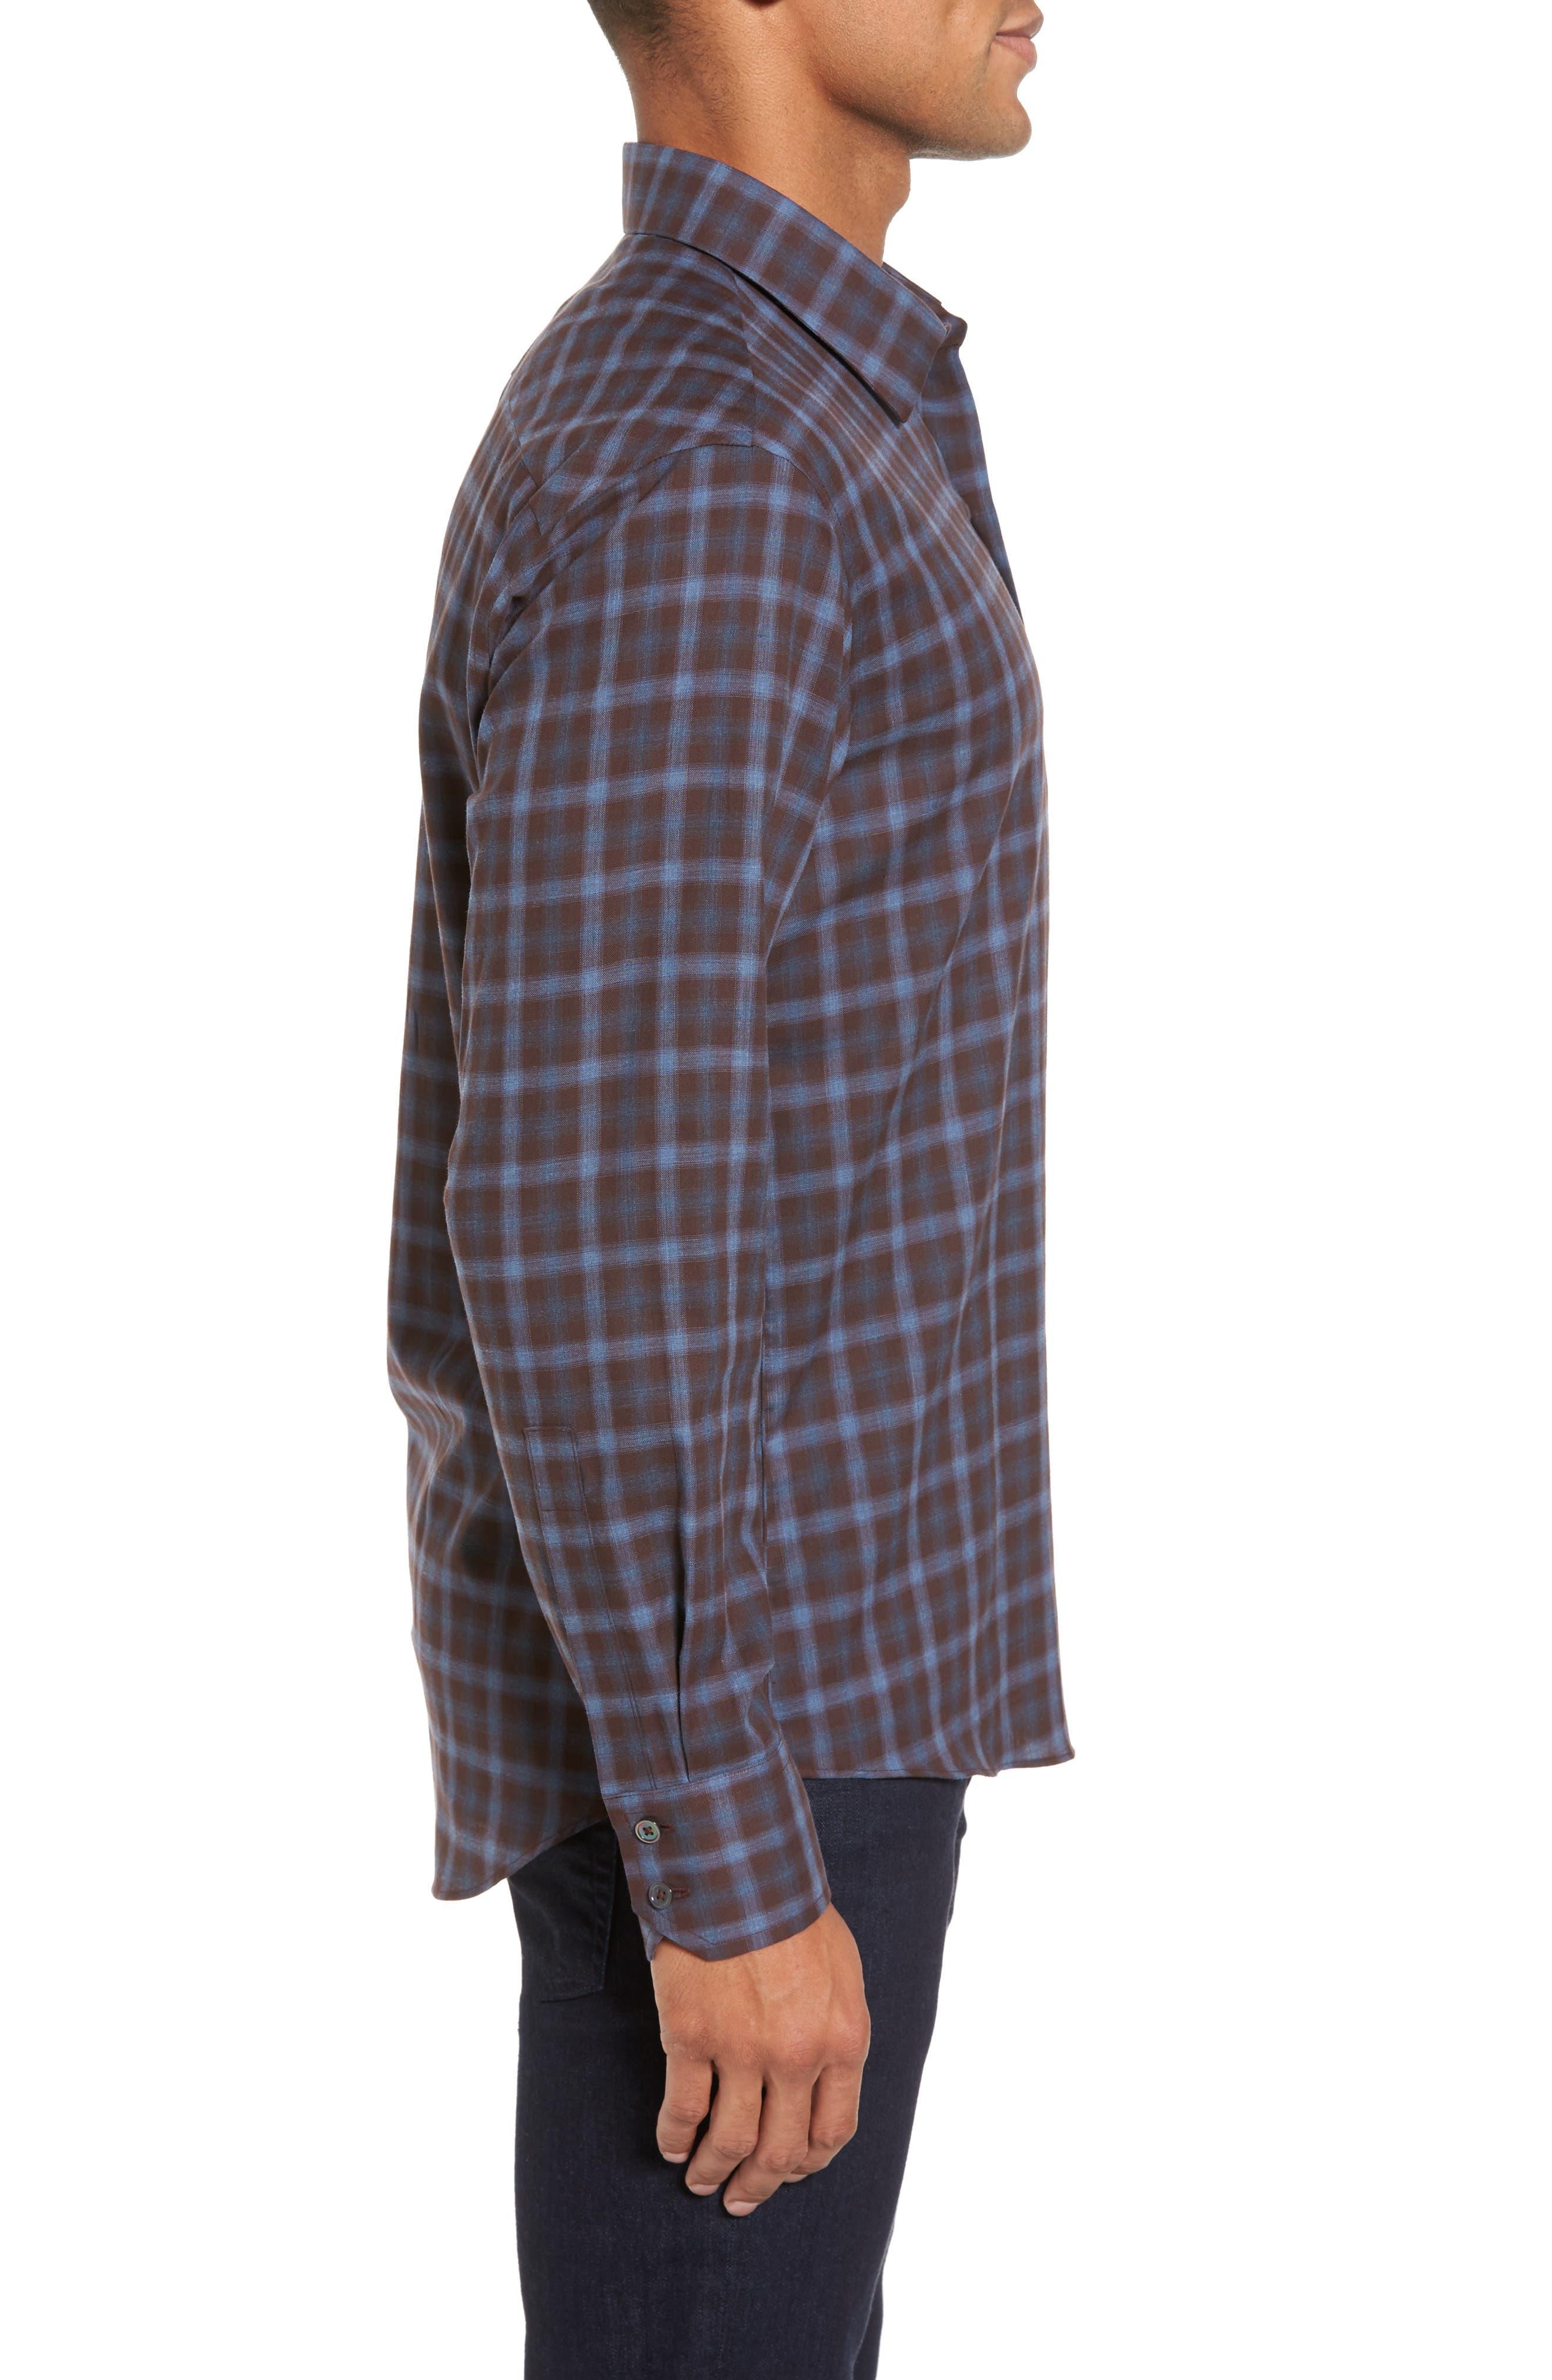 Fathollahi Slim Fit Plaid Sport Shirt,                             Alternate thumbnail 3, color,                             200